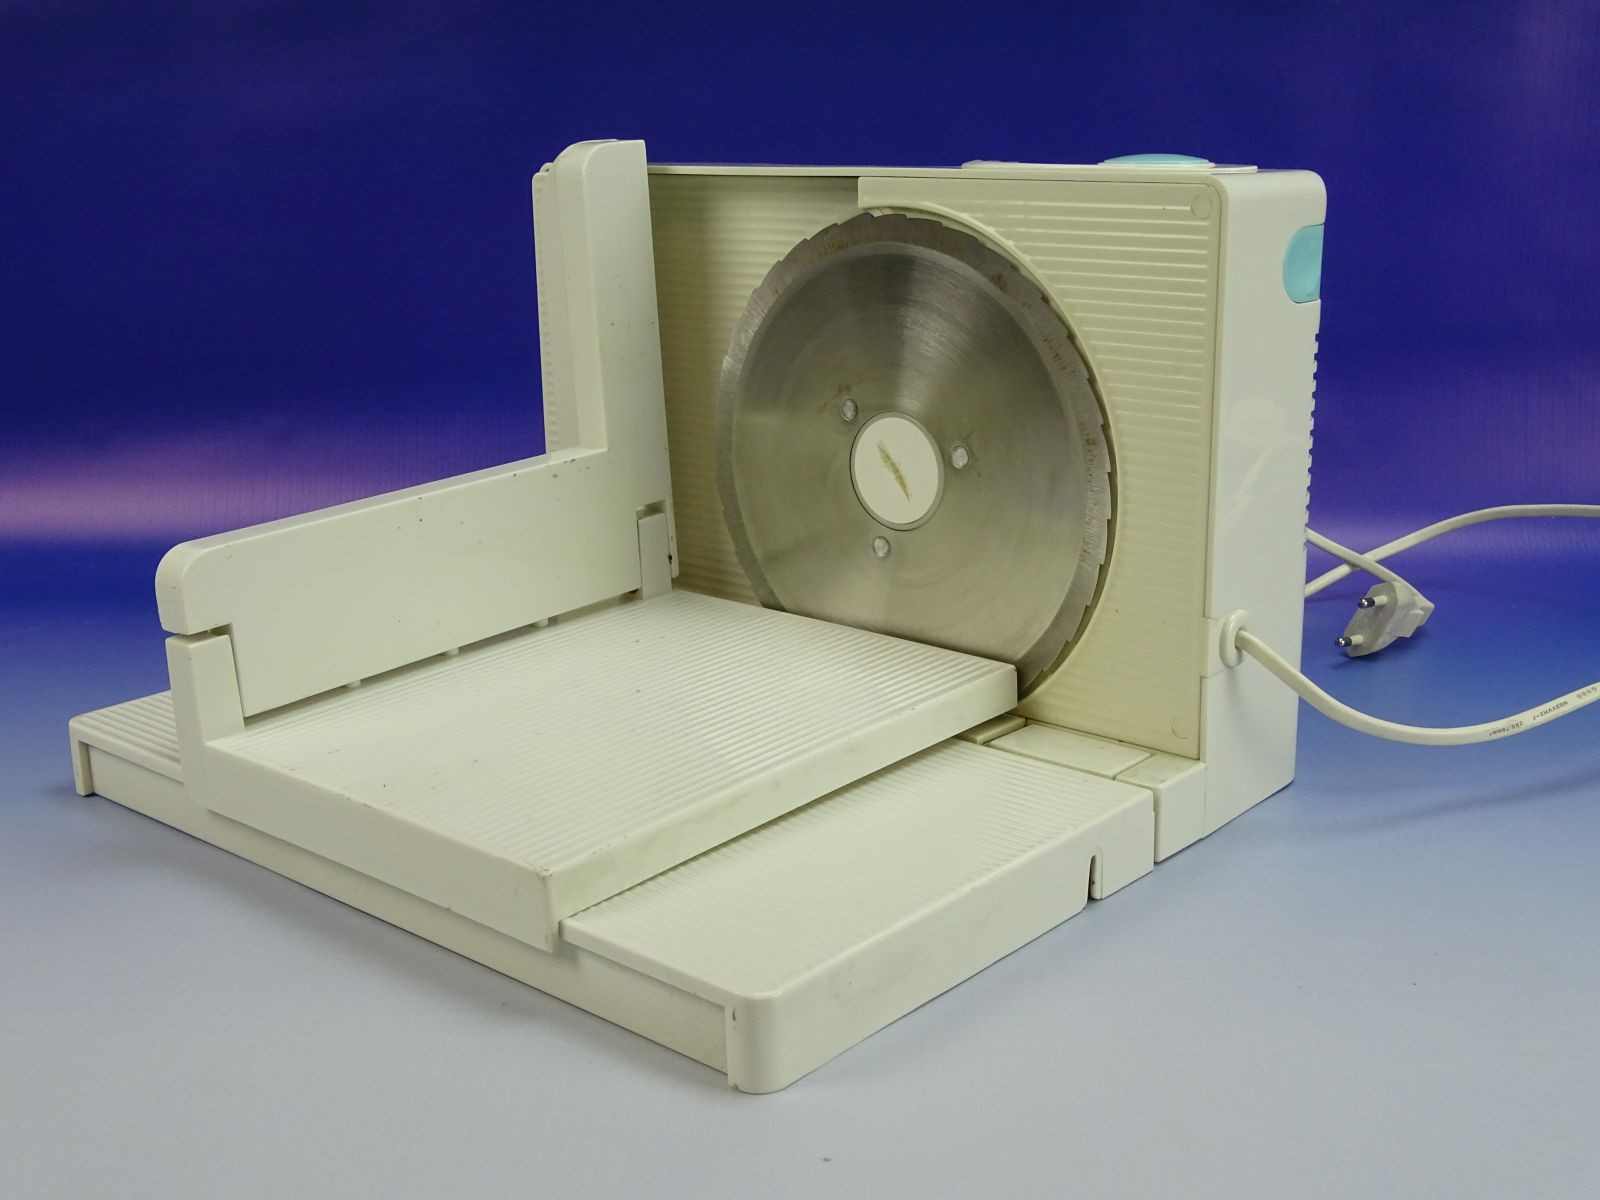 DSC07454.JPG (1600�1200)